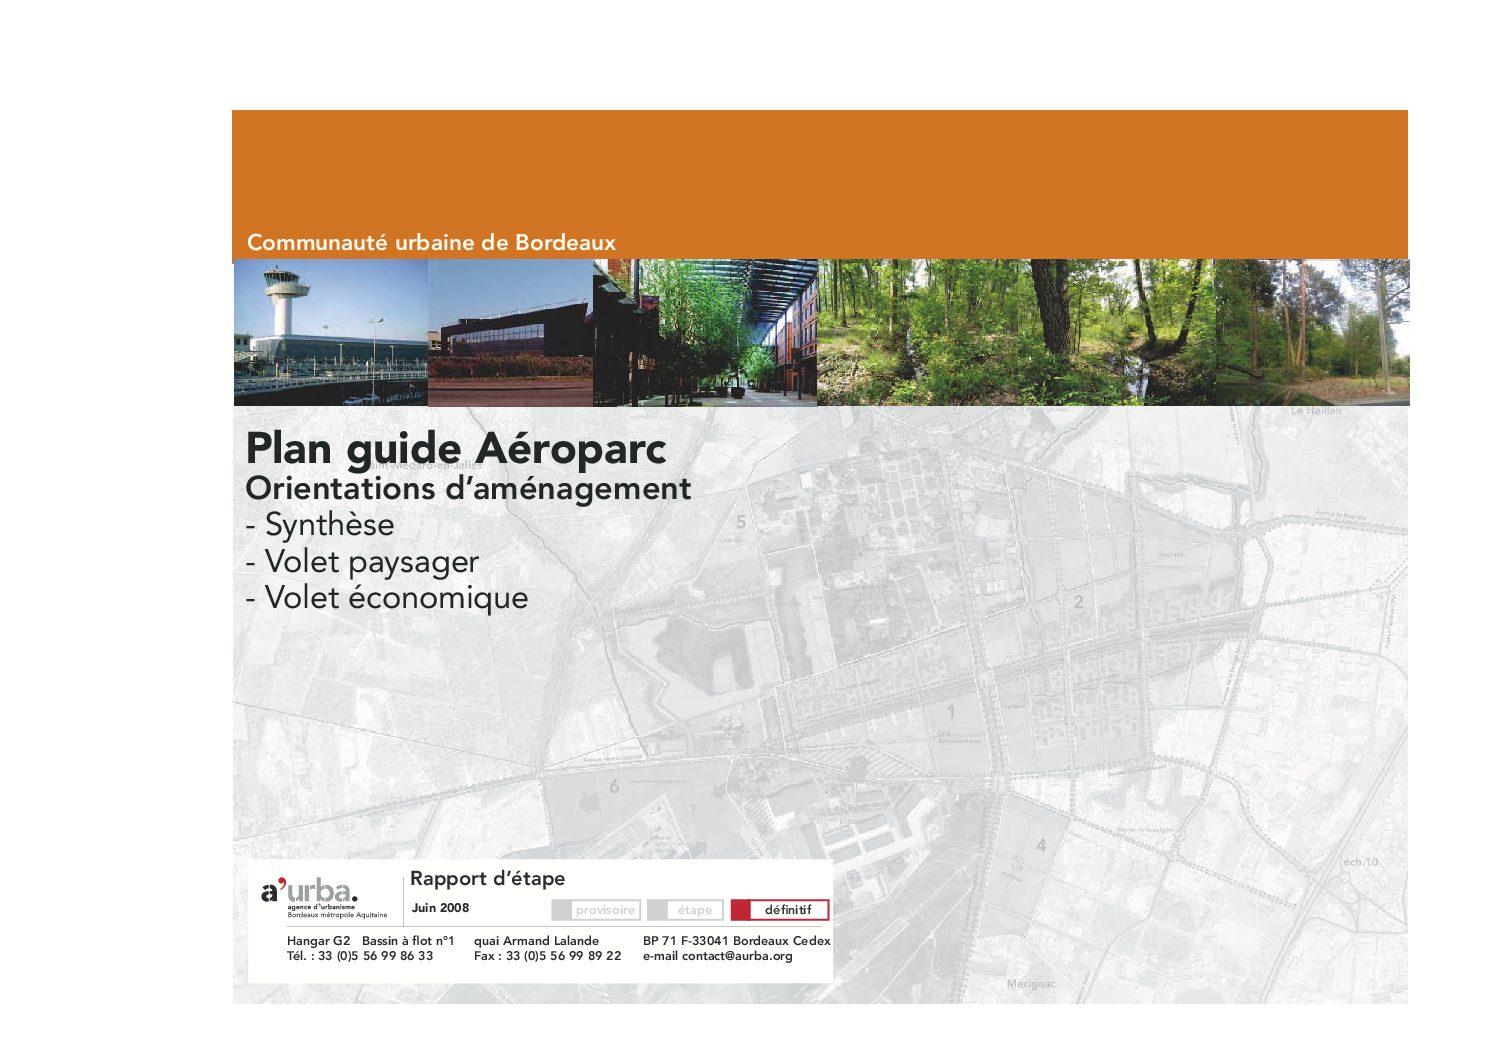 Plan guide a roparc a 39 urba agence d 39 urbanisme bordeaux for Agence urbanisme paysage bordeaux